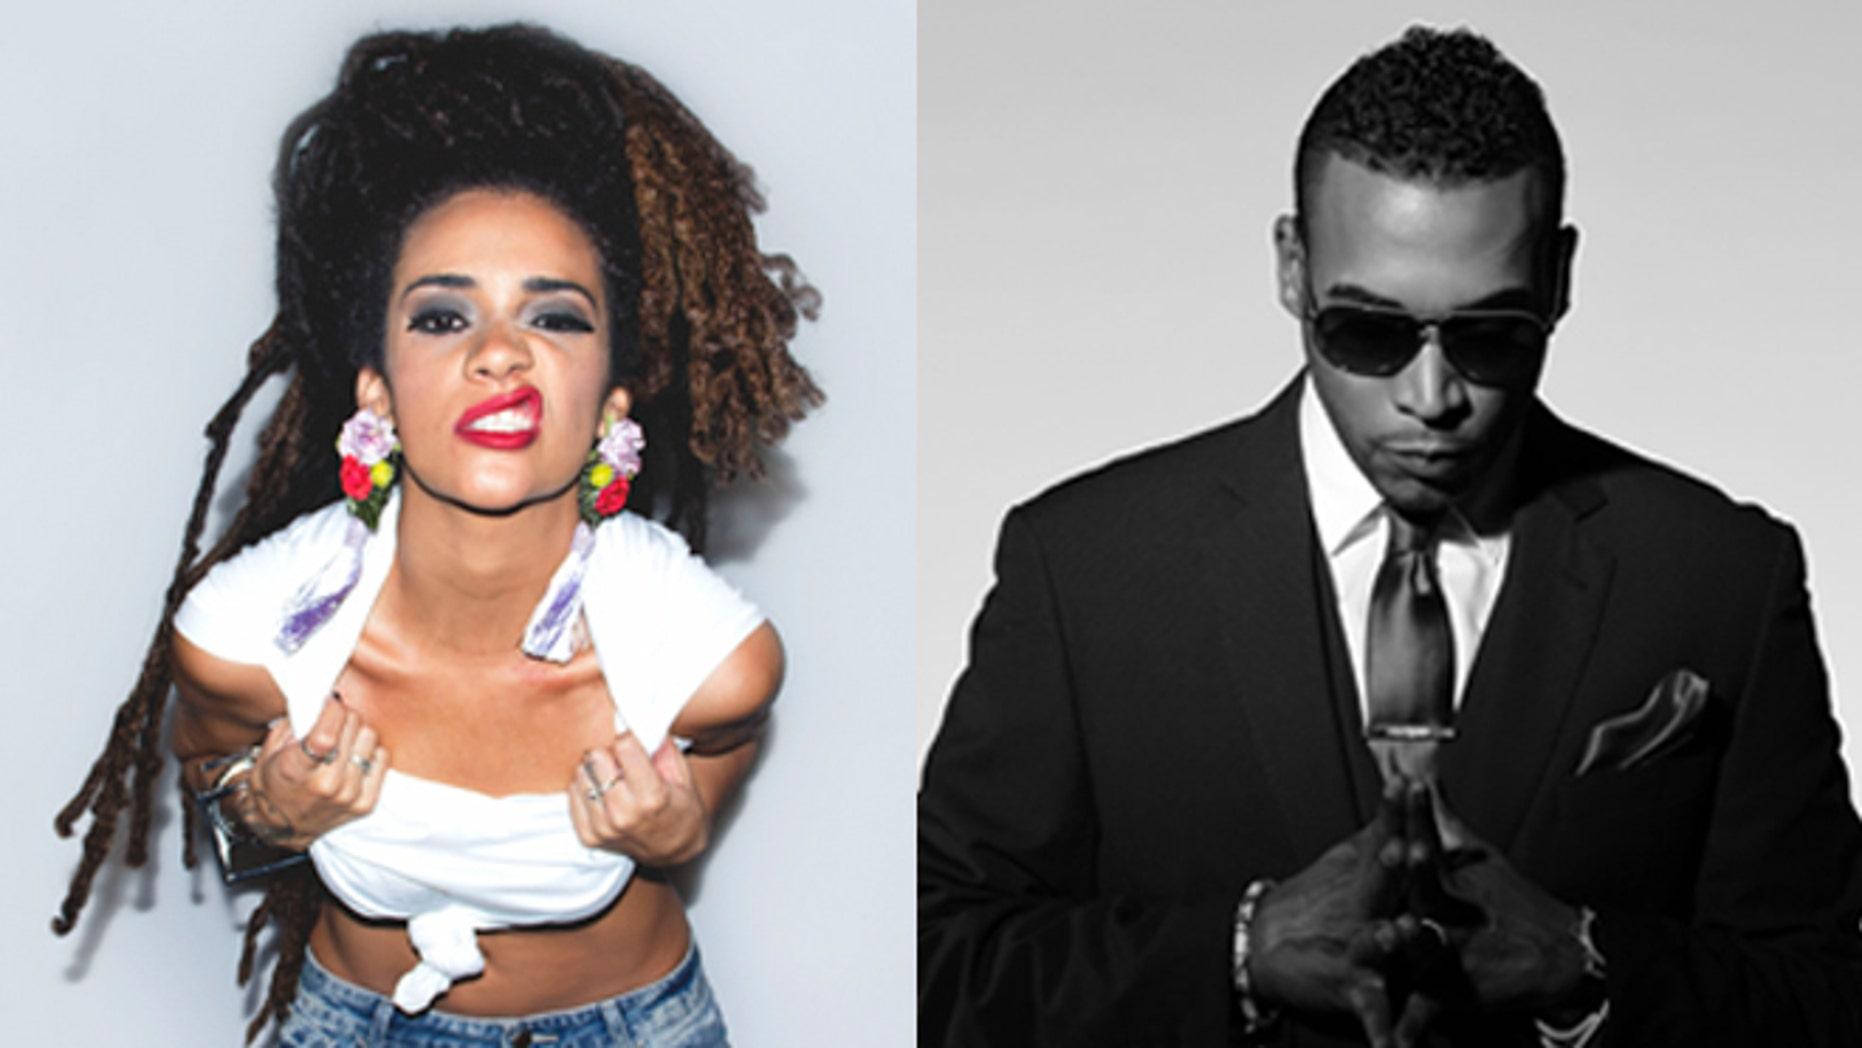 This year's Soulfrito lineup includes Puerto Rican singer-songwriter Calma Carmona, left, and El Rey de reggaeton, Don Omar. (Photos: Courtesy Soulfrito music festival)